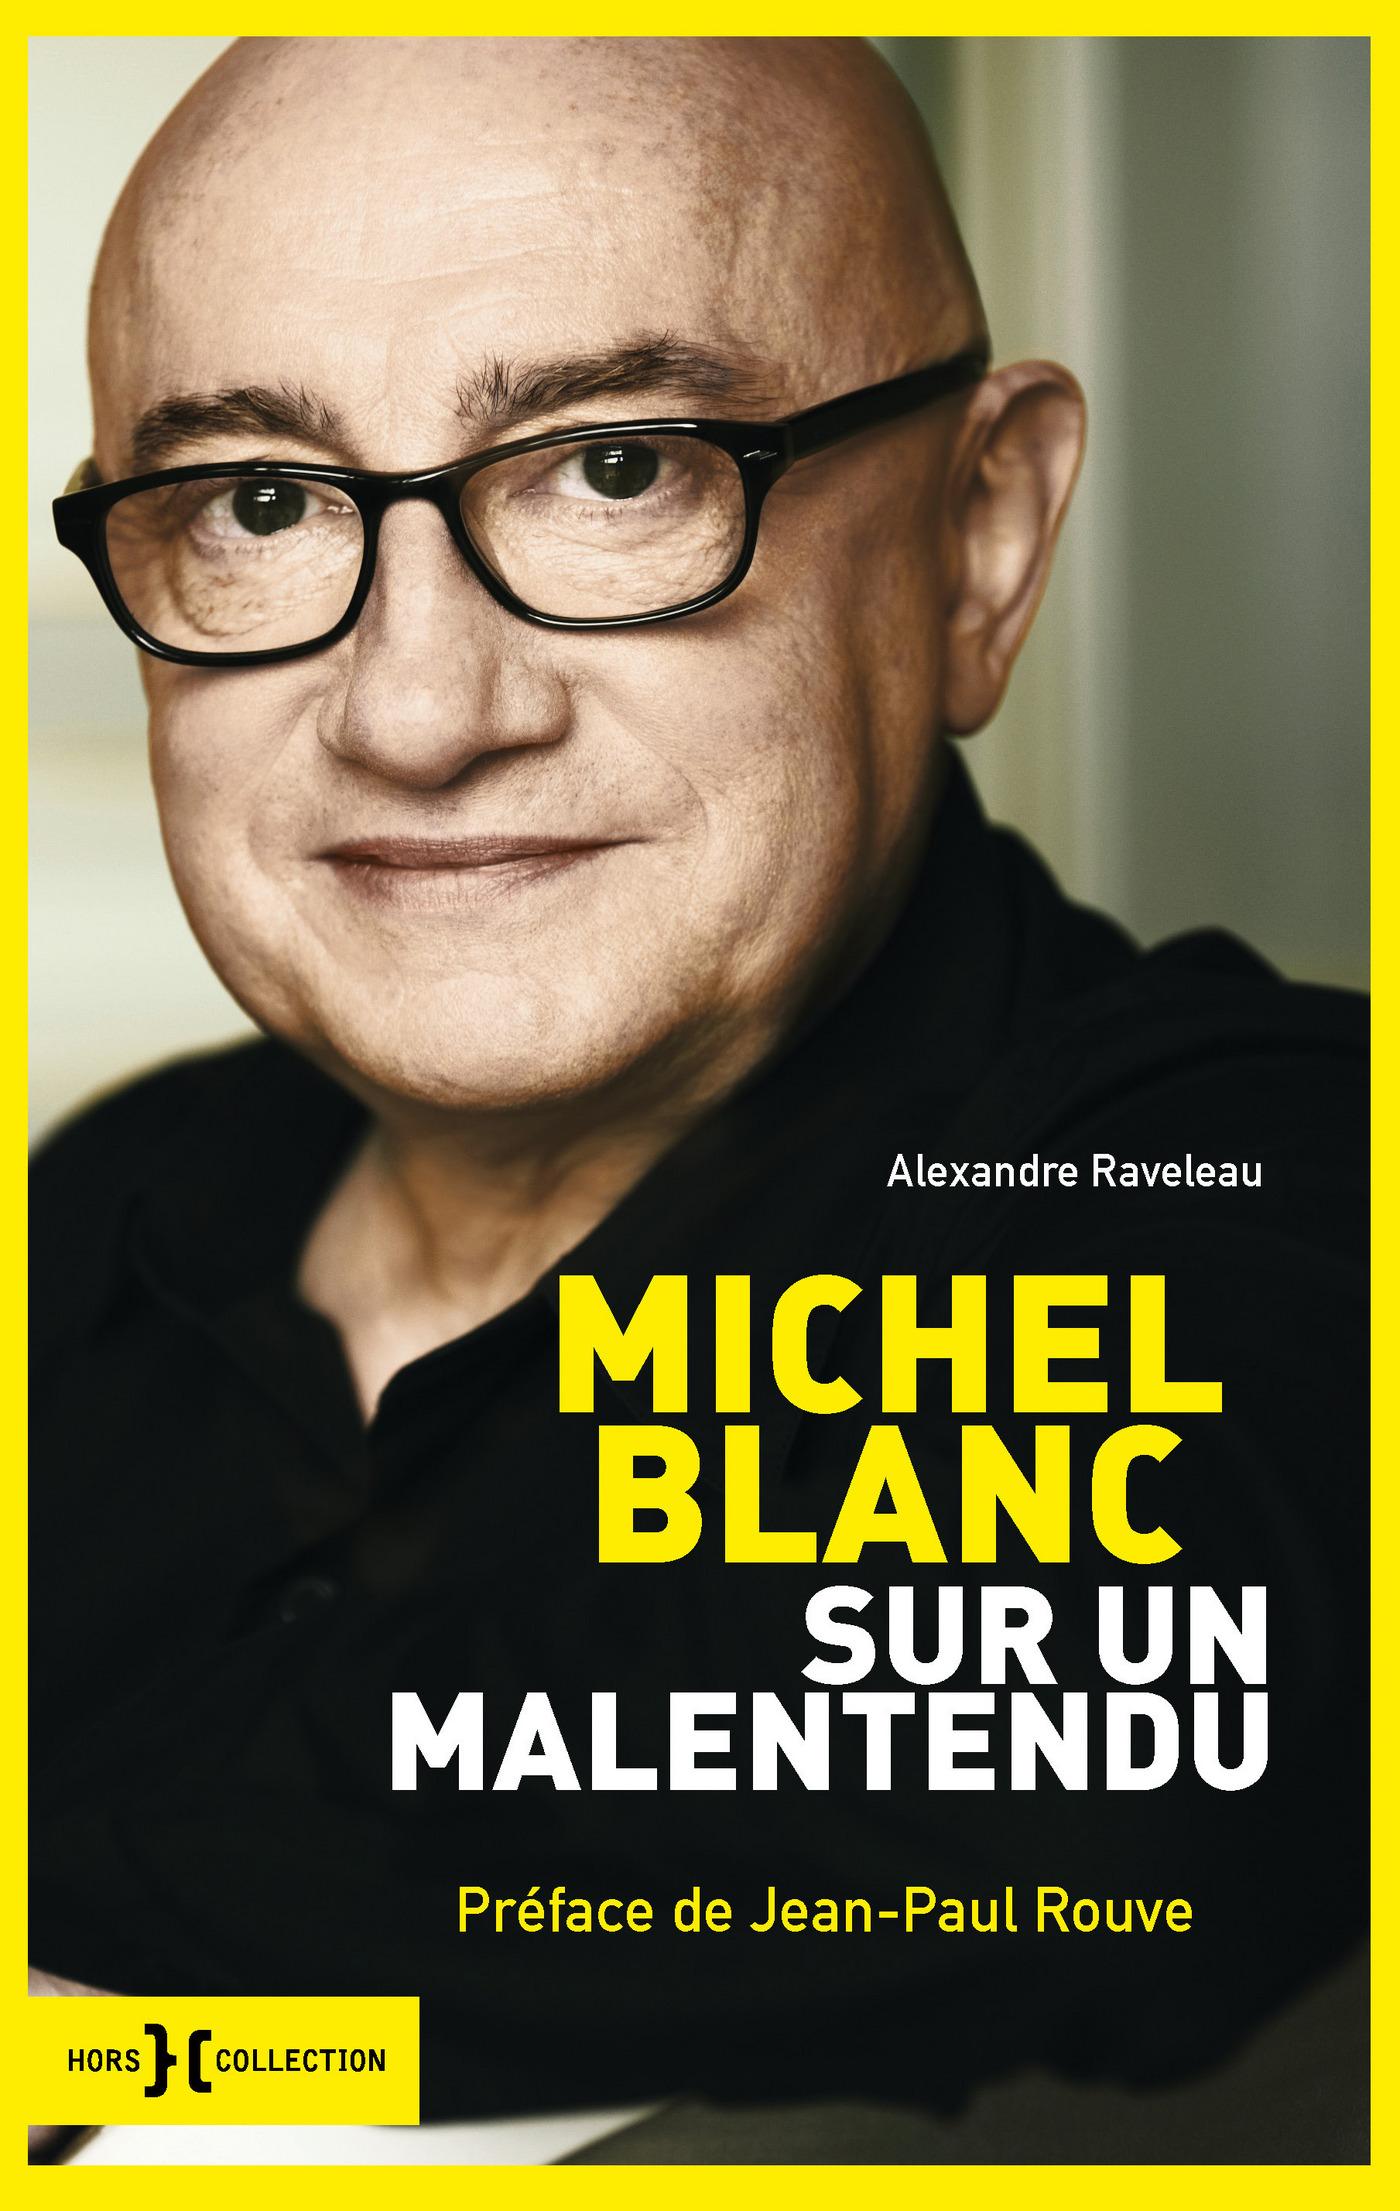 Michel Blanc | RAVELEAU, Alexandre